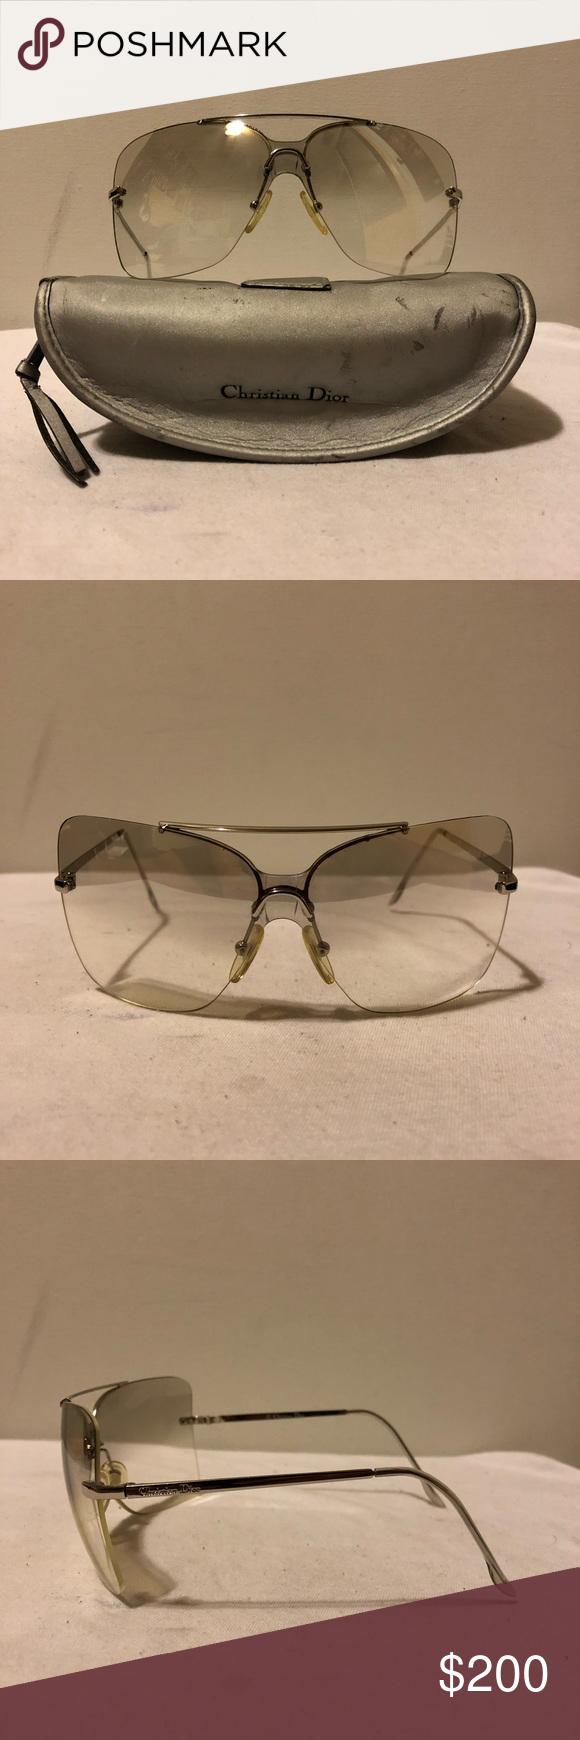 ad22d19eba40 Vintage Christian Dior motard Glasses Vintage Christian Dior Motard Glasses  In great condition Dior Accessories Glasses